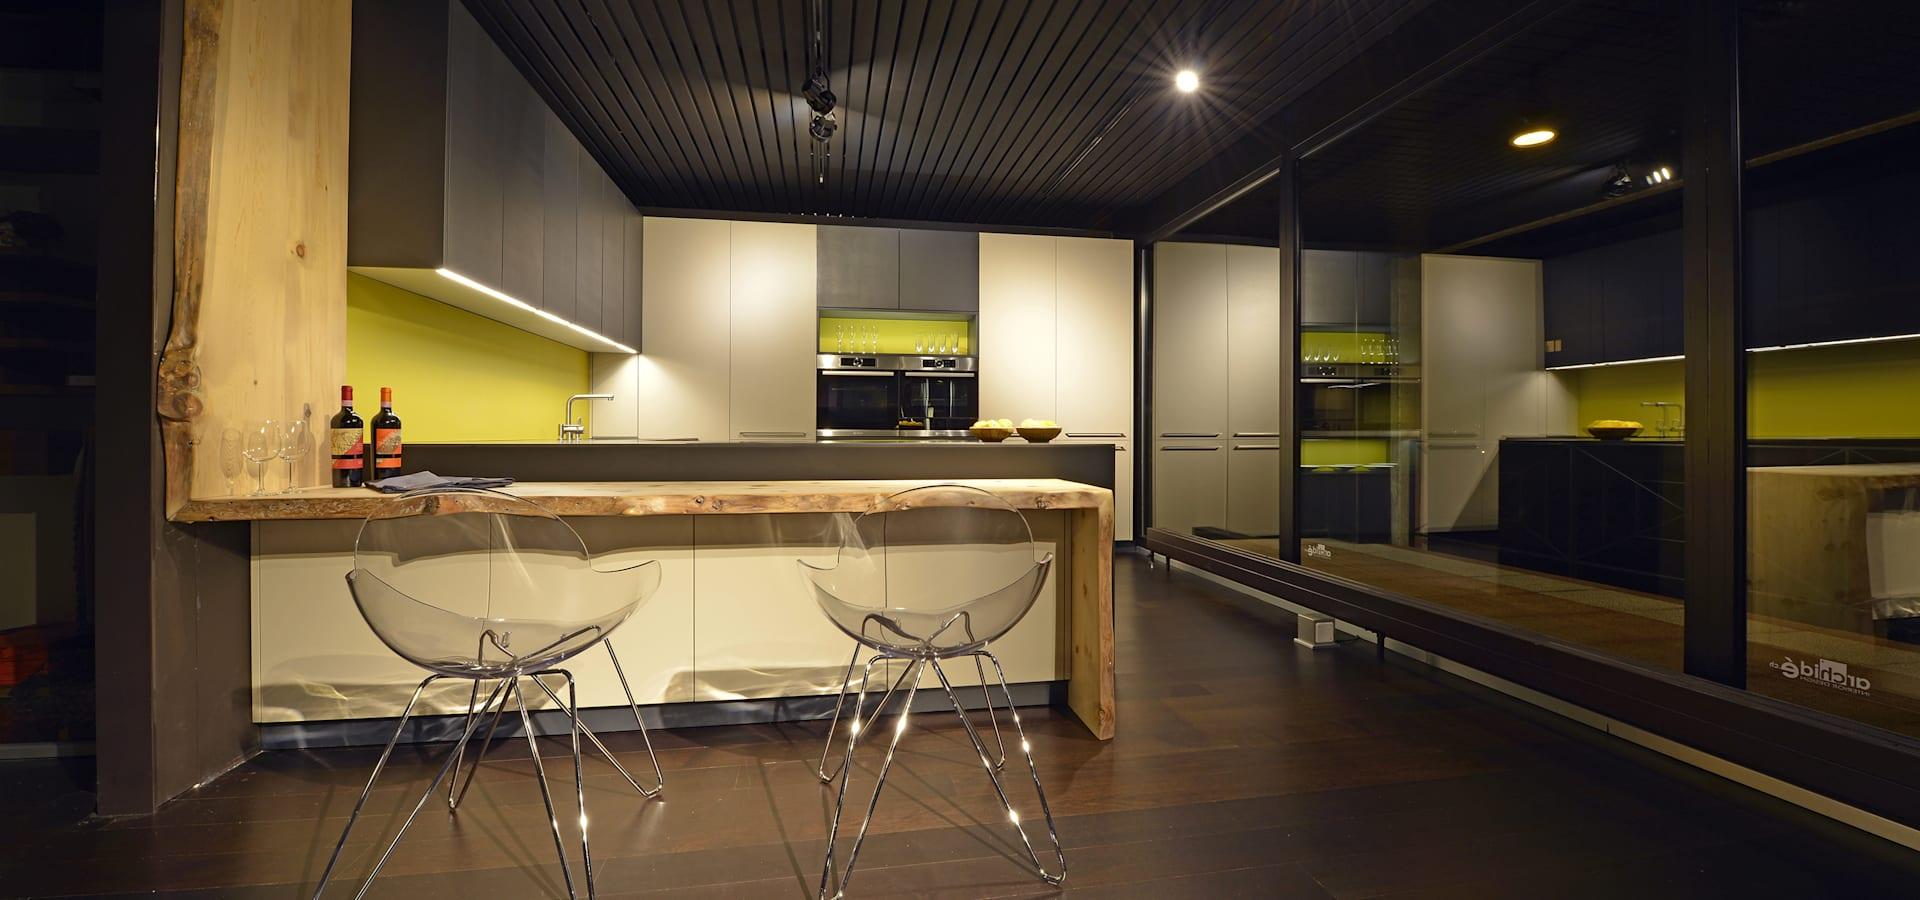 Stunning Interior Design Cucine Images - harrop.us - harrop.us